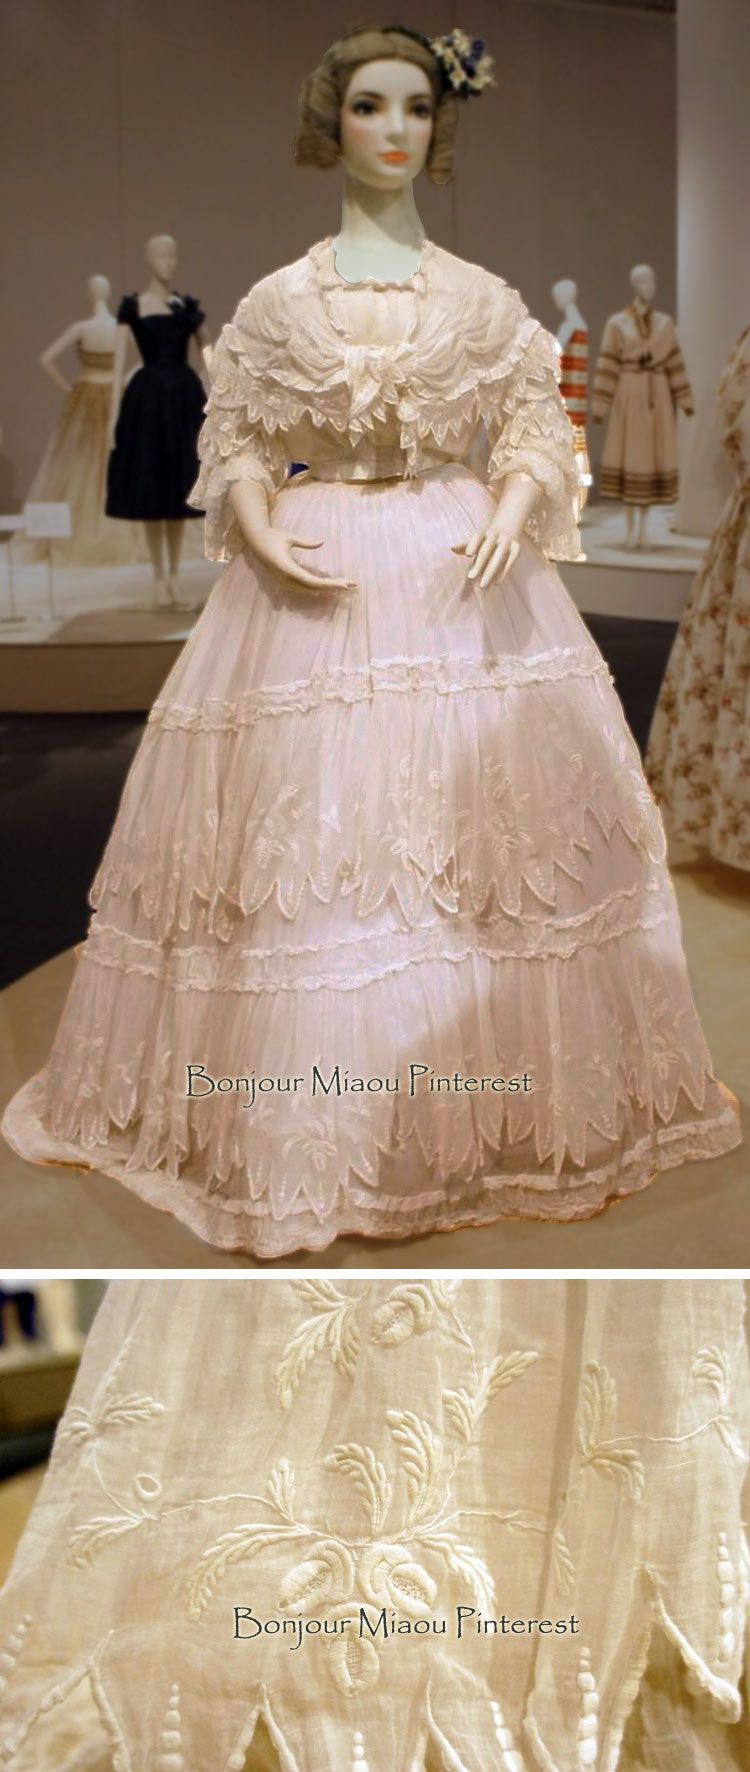 Summer Dress Ca 1860s Kobe Fashion Museum Facebook Historical Dresses Victorian Fashion Victorian Gown [ 1772 x 750 Pixel ]